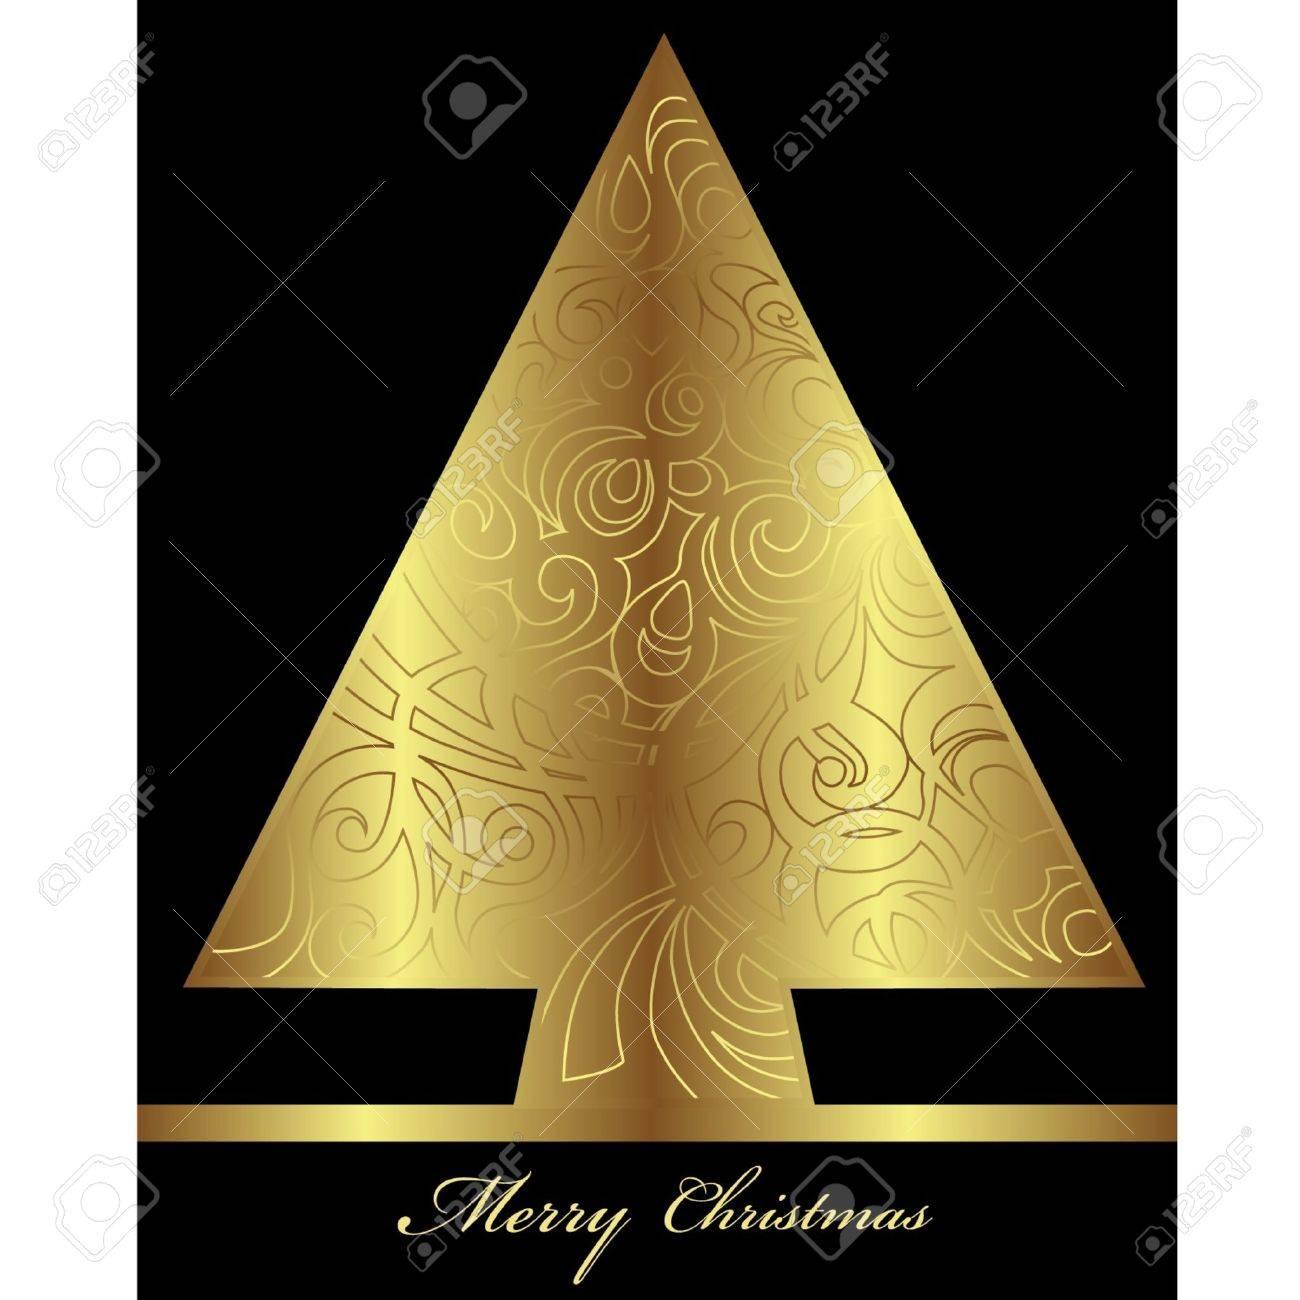 Merry Christmas Stock Vector - 11175067